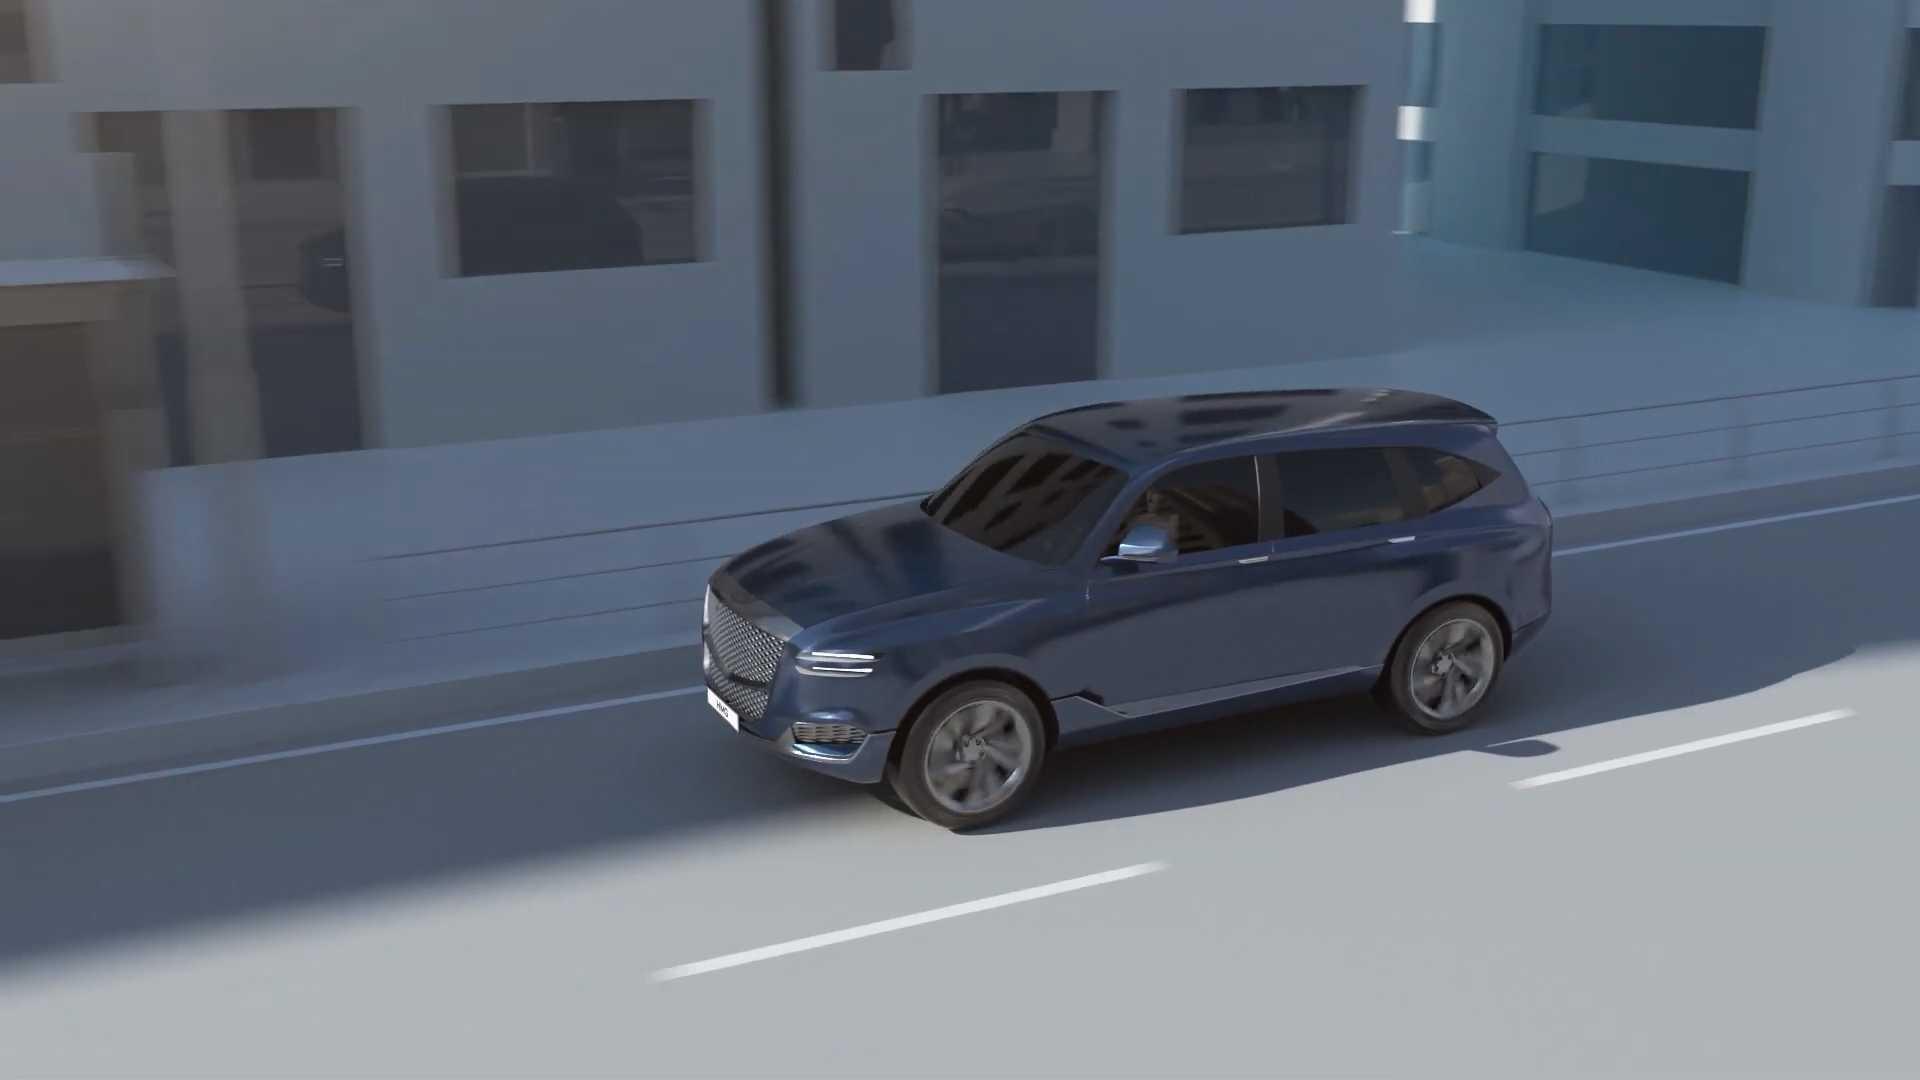 82 New 2020 Hyundai Genesis Suv Configurations for 2020 Hyundai Genesis Suv